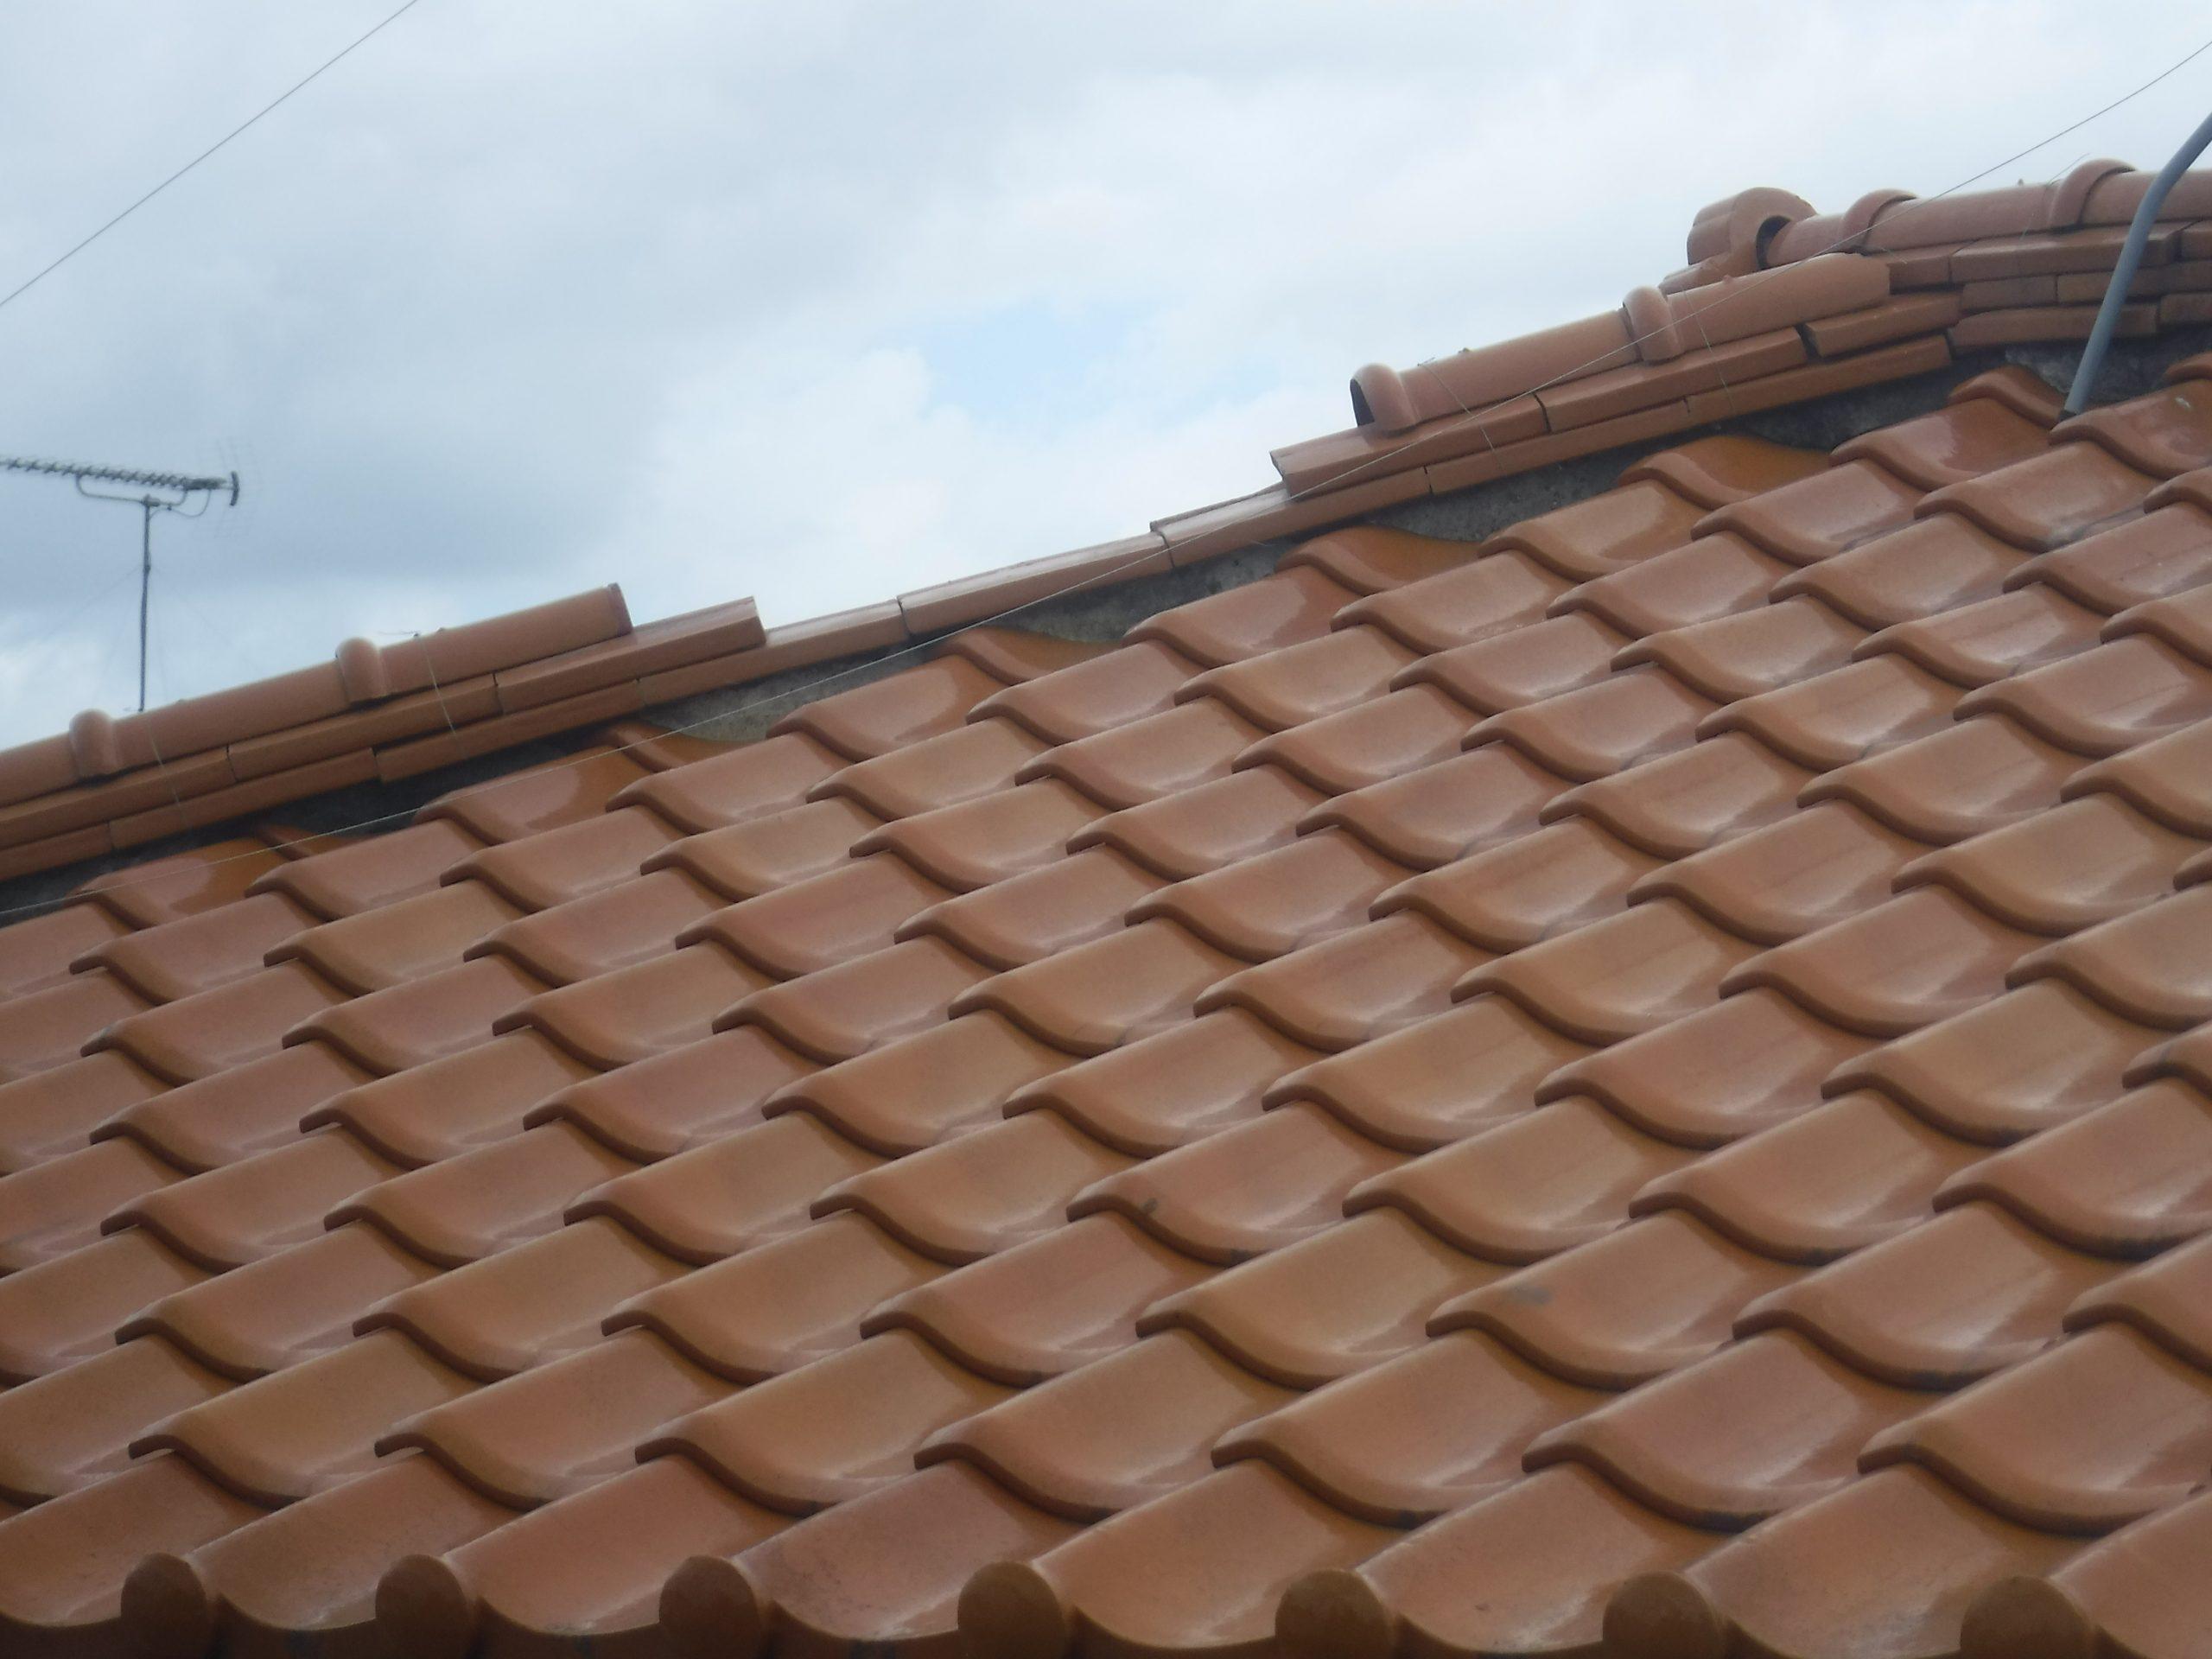 台風で屋根破損